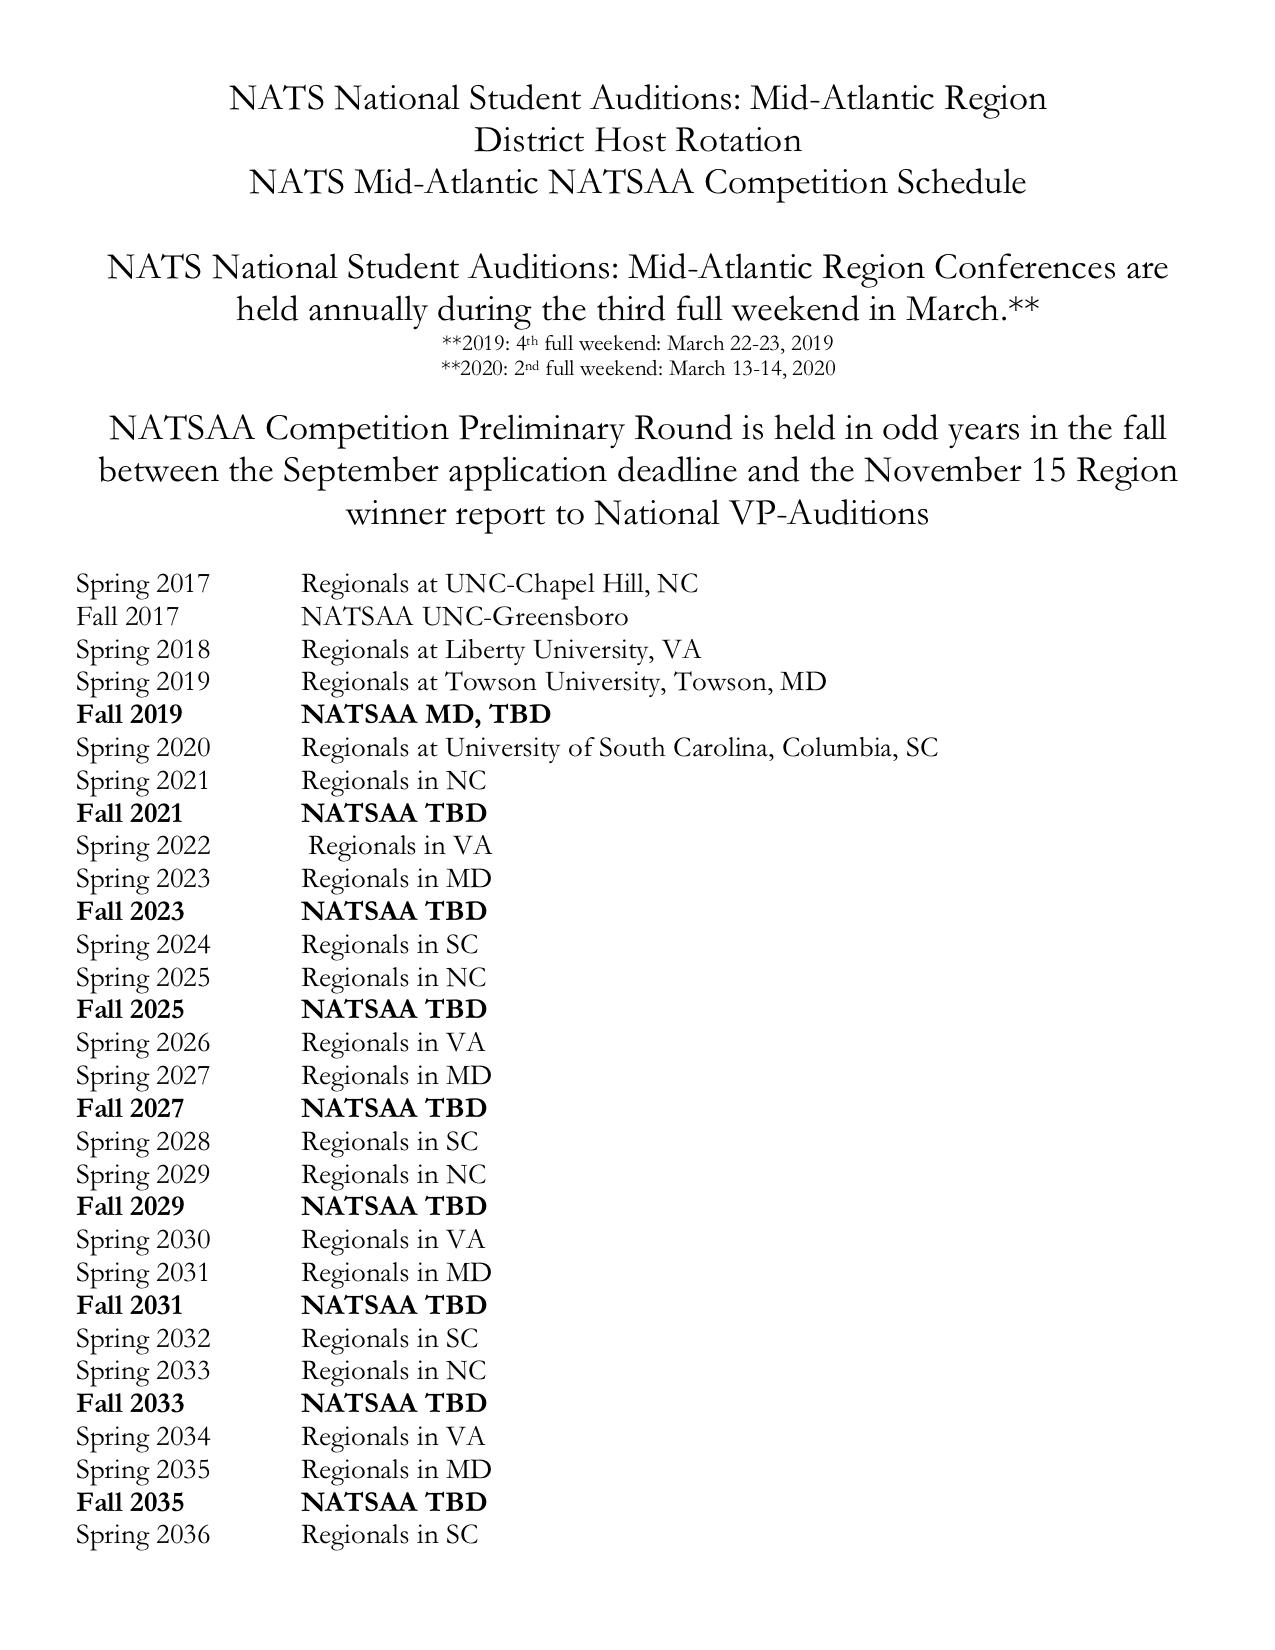 Regional and NATSAA Rotation Schedule through 2036.jpg